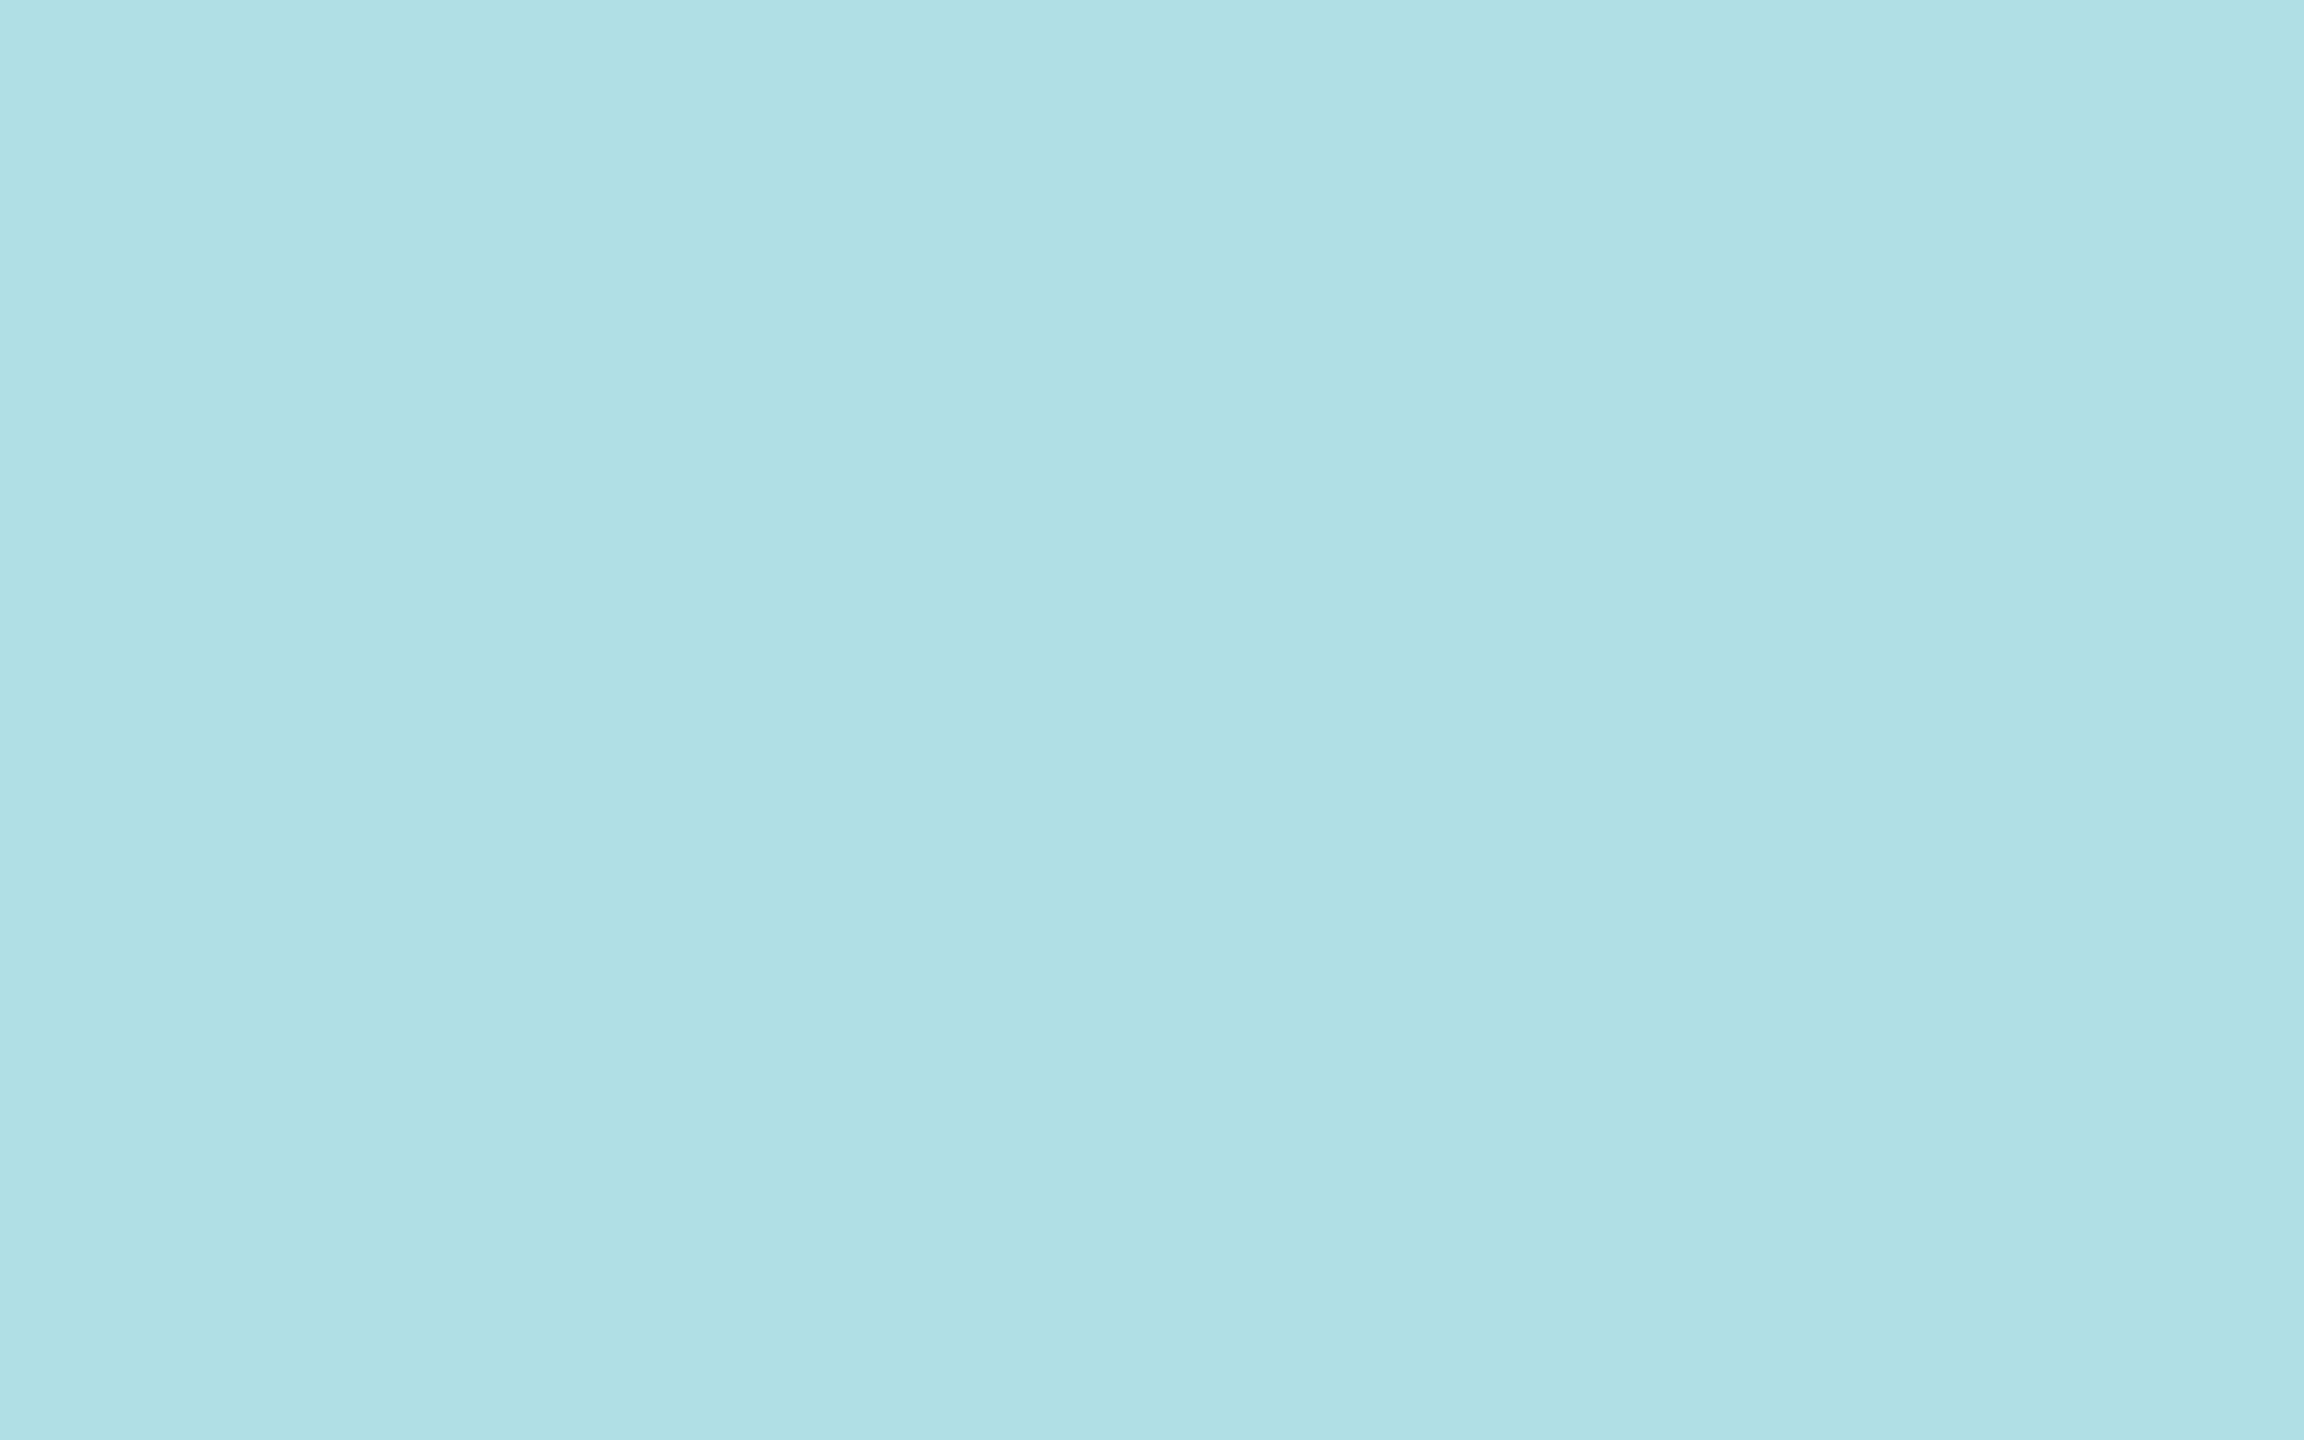 2304x1440 Powder Blue Web Solid Color Background